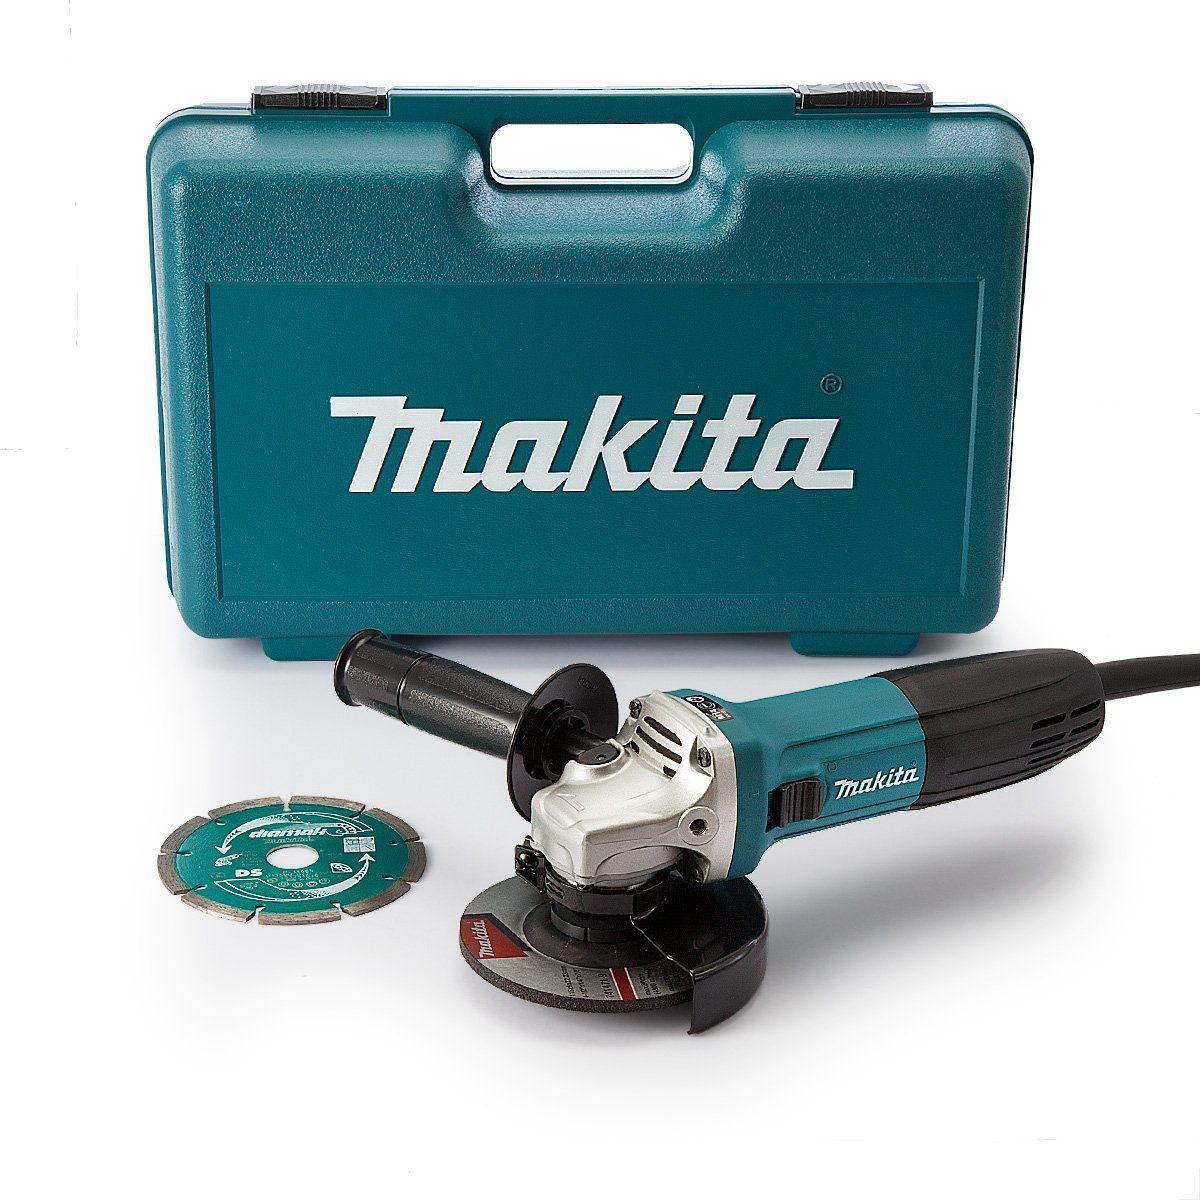 Makita GA4530RKD Angle Grinder Review